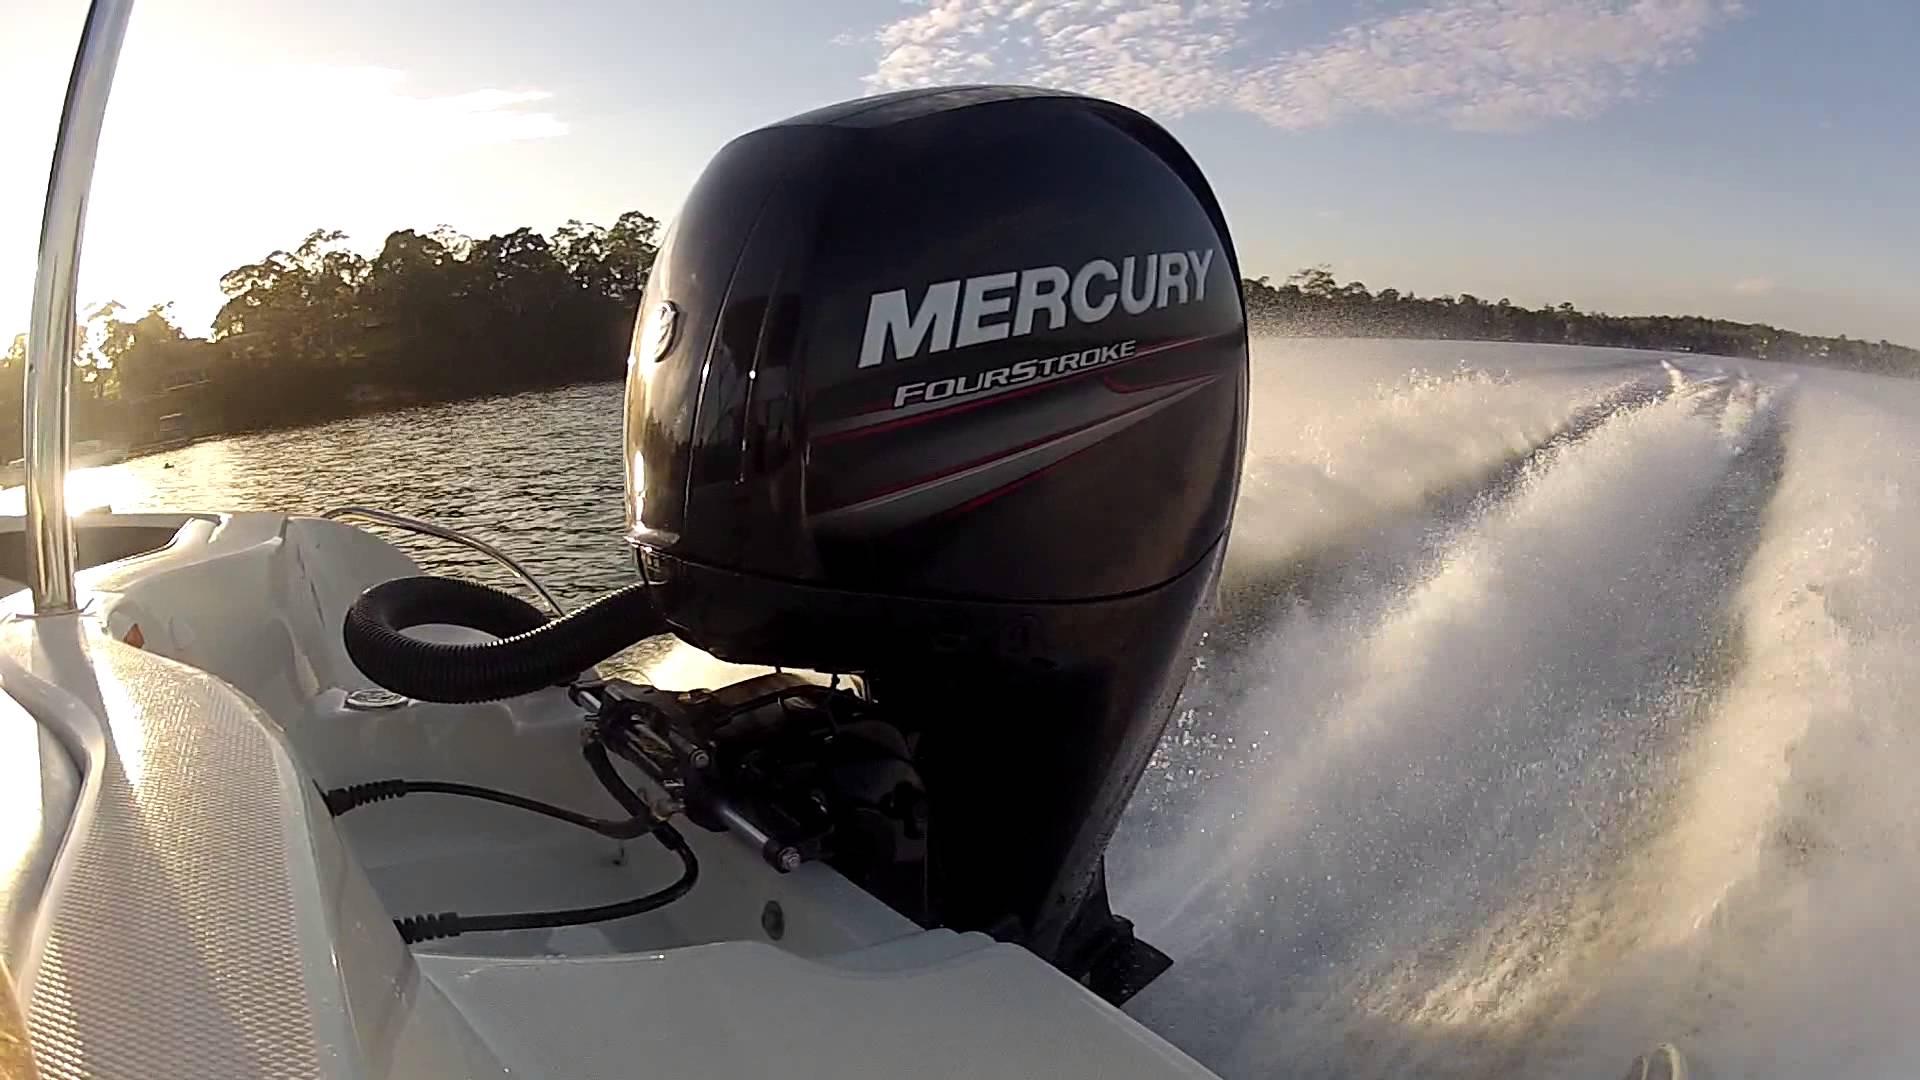 2004 Mercury 60 Hp Outboard